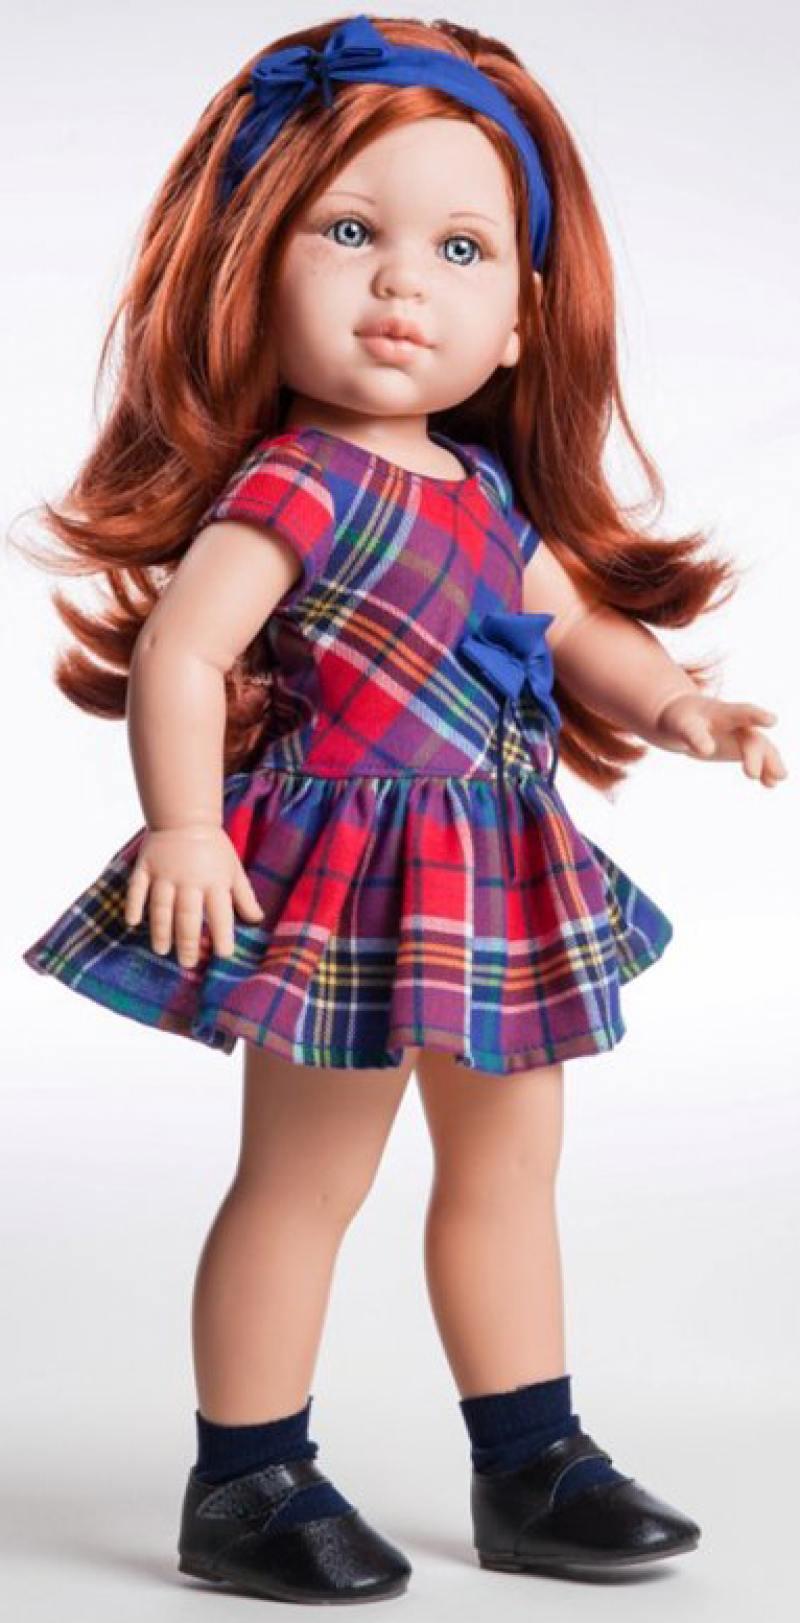 Кукла Paola Reina Бекки 42 см 06007 paola reina горди без одежды 34 см 34021